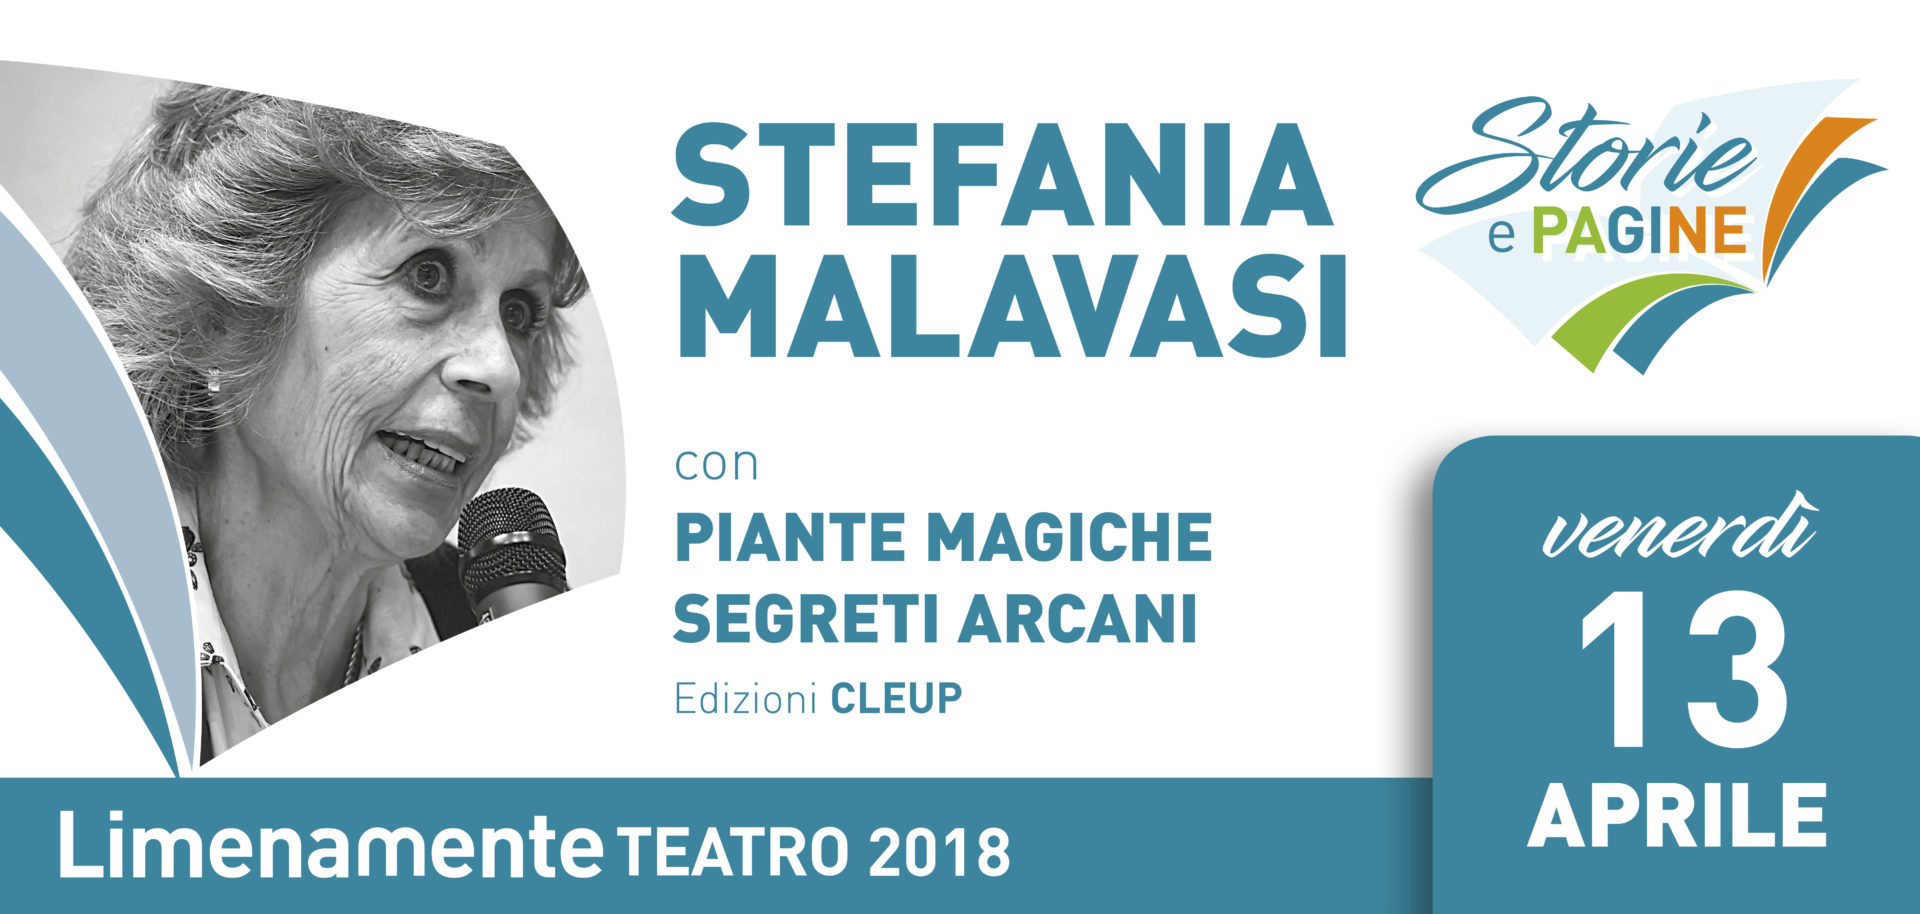 Storie e Pagine – Stefania Malavasi